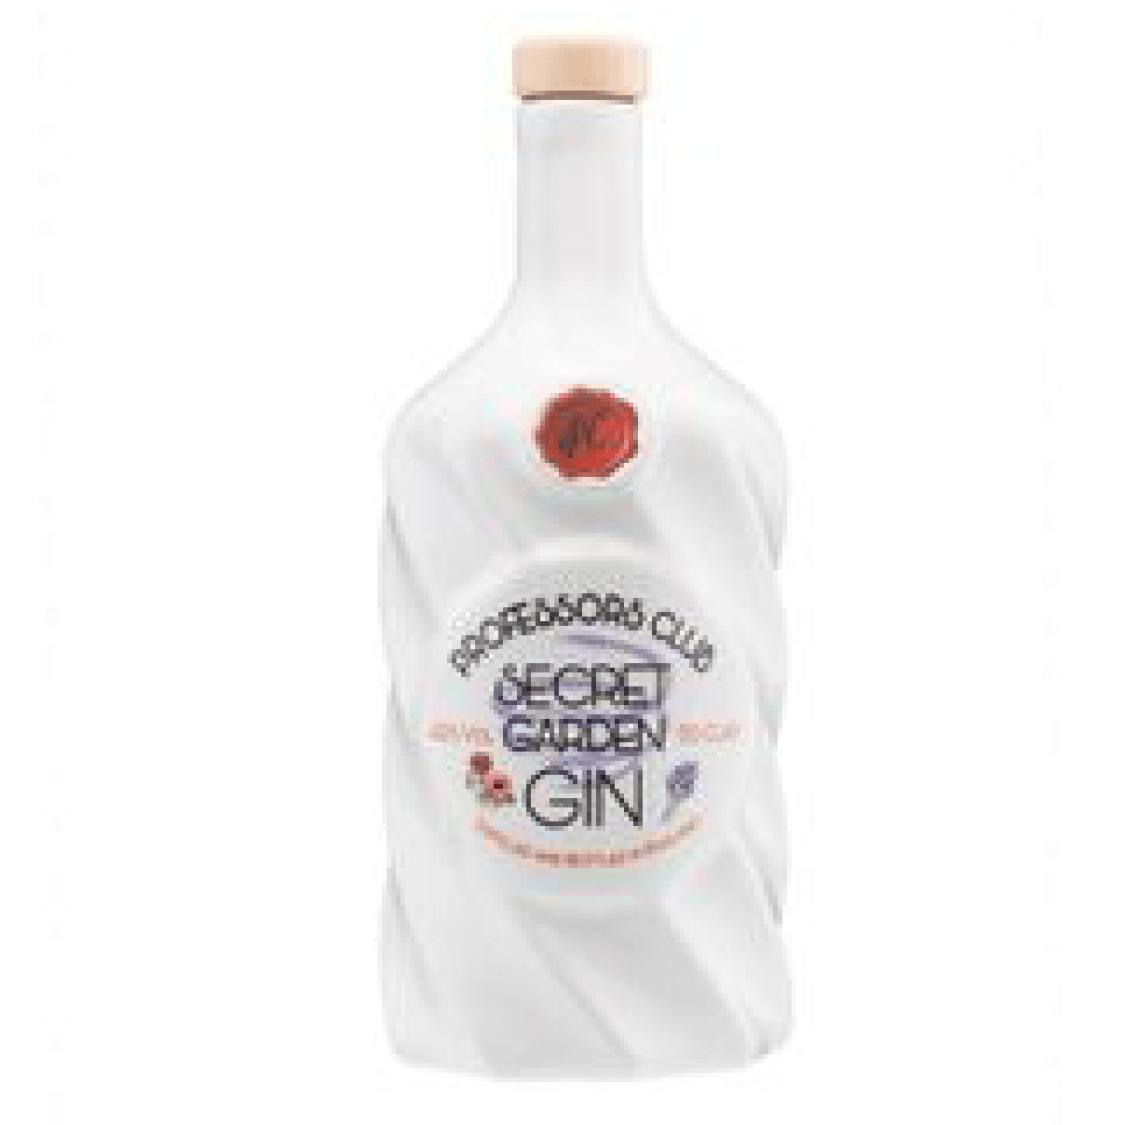 Professors Club Secret Garden Gin - Shop The Bar - Female Original